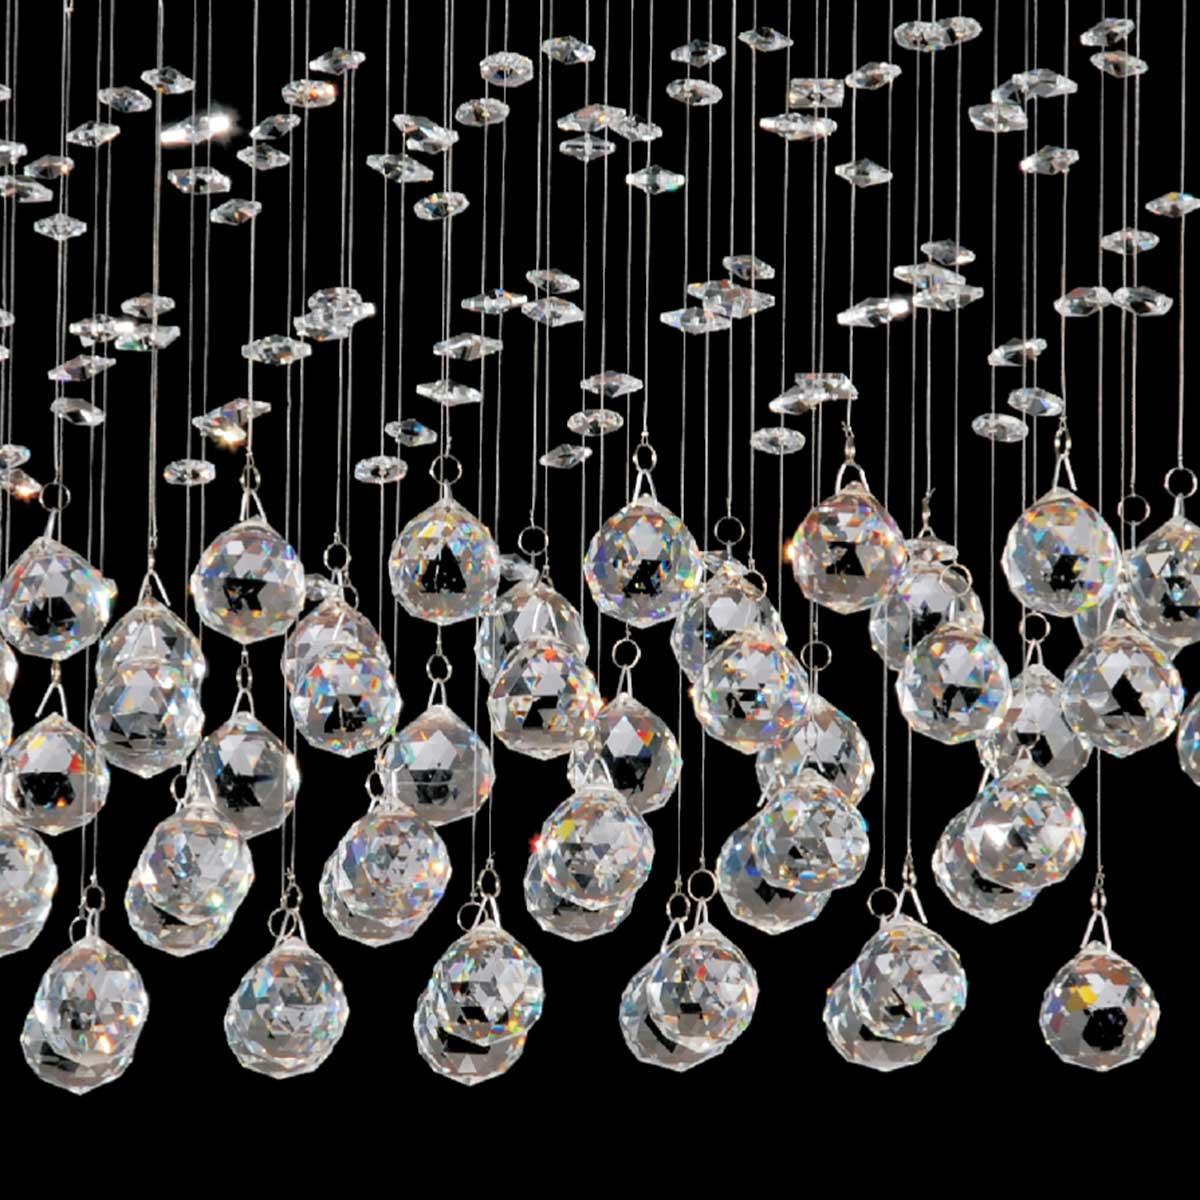 Pendente Star Cristal 59cm 4 Lamp. Gu10